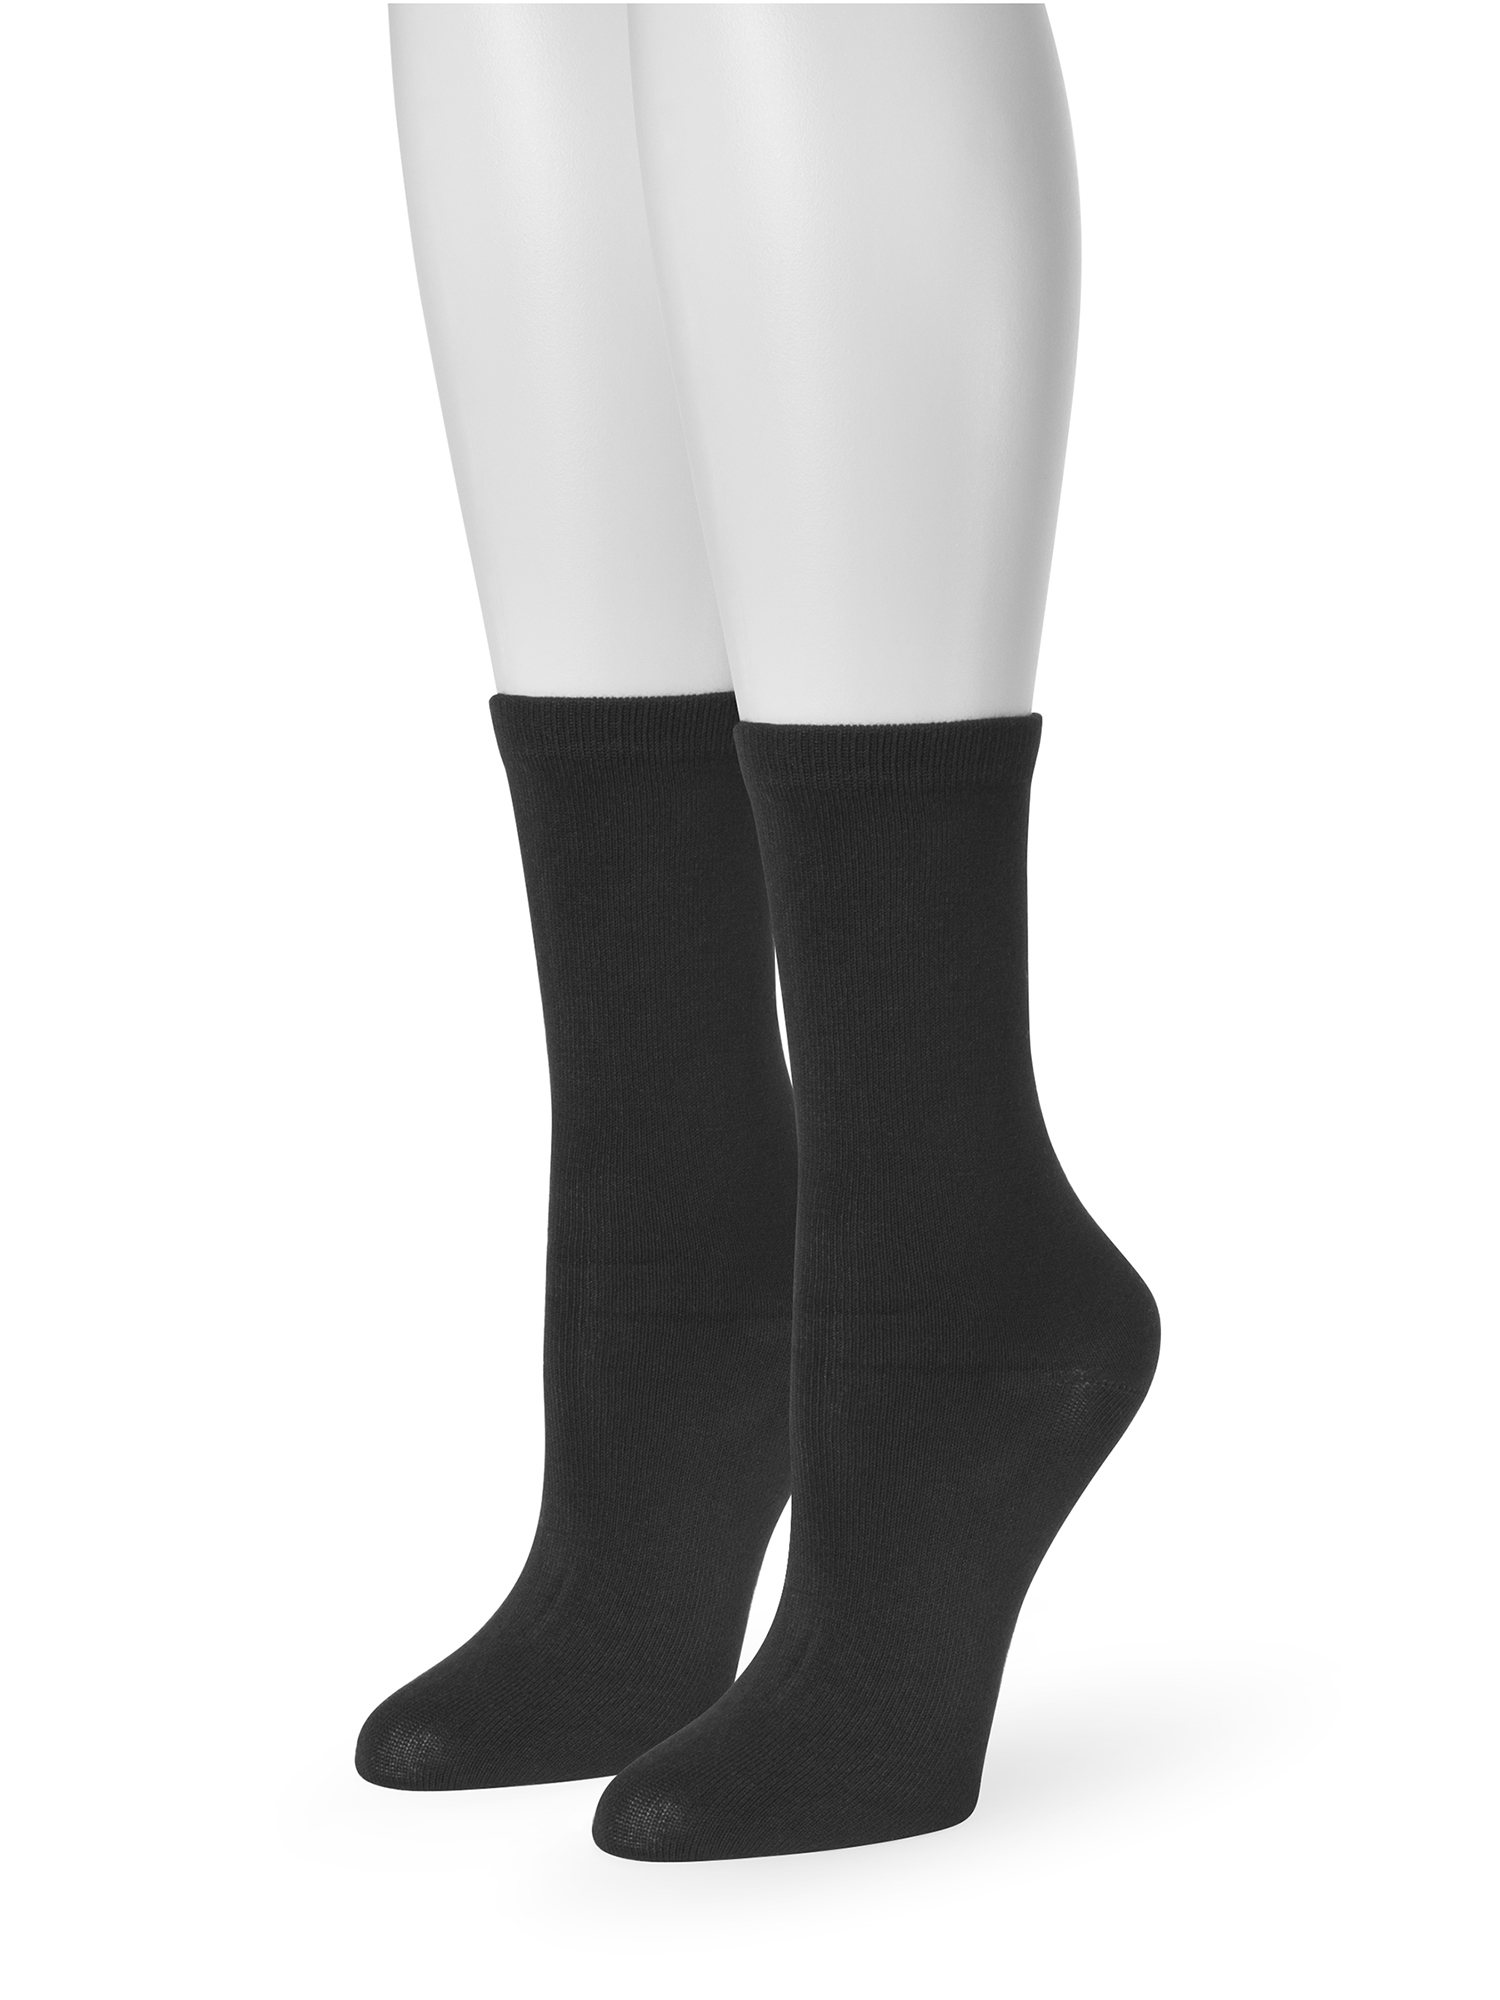 Women's Fine Gauge Crew Length 8 Sock 2-Pack